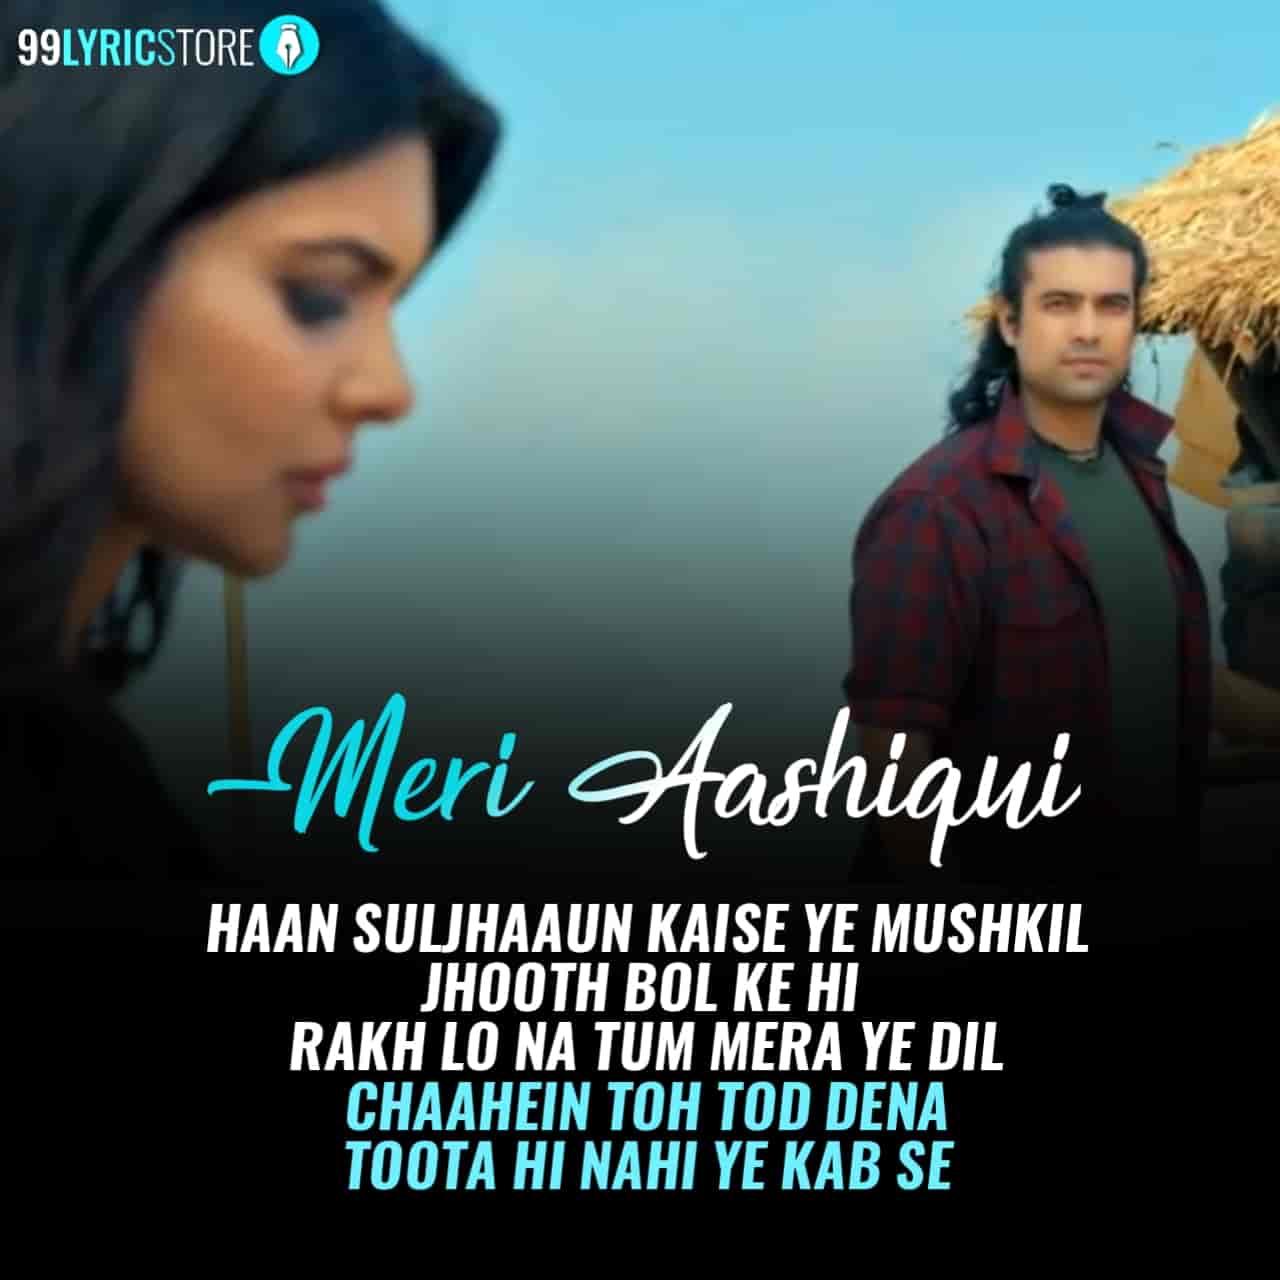 Meri Aashiqui Song Image By Jubin Nautiyal features Ihana Dhillon